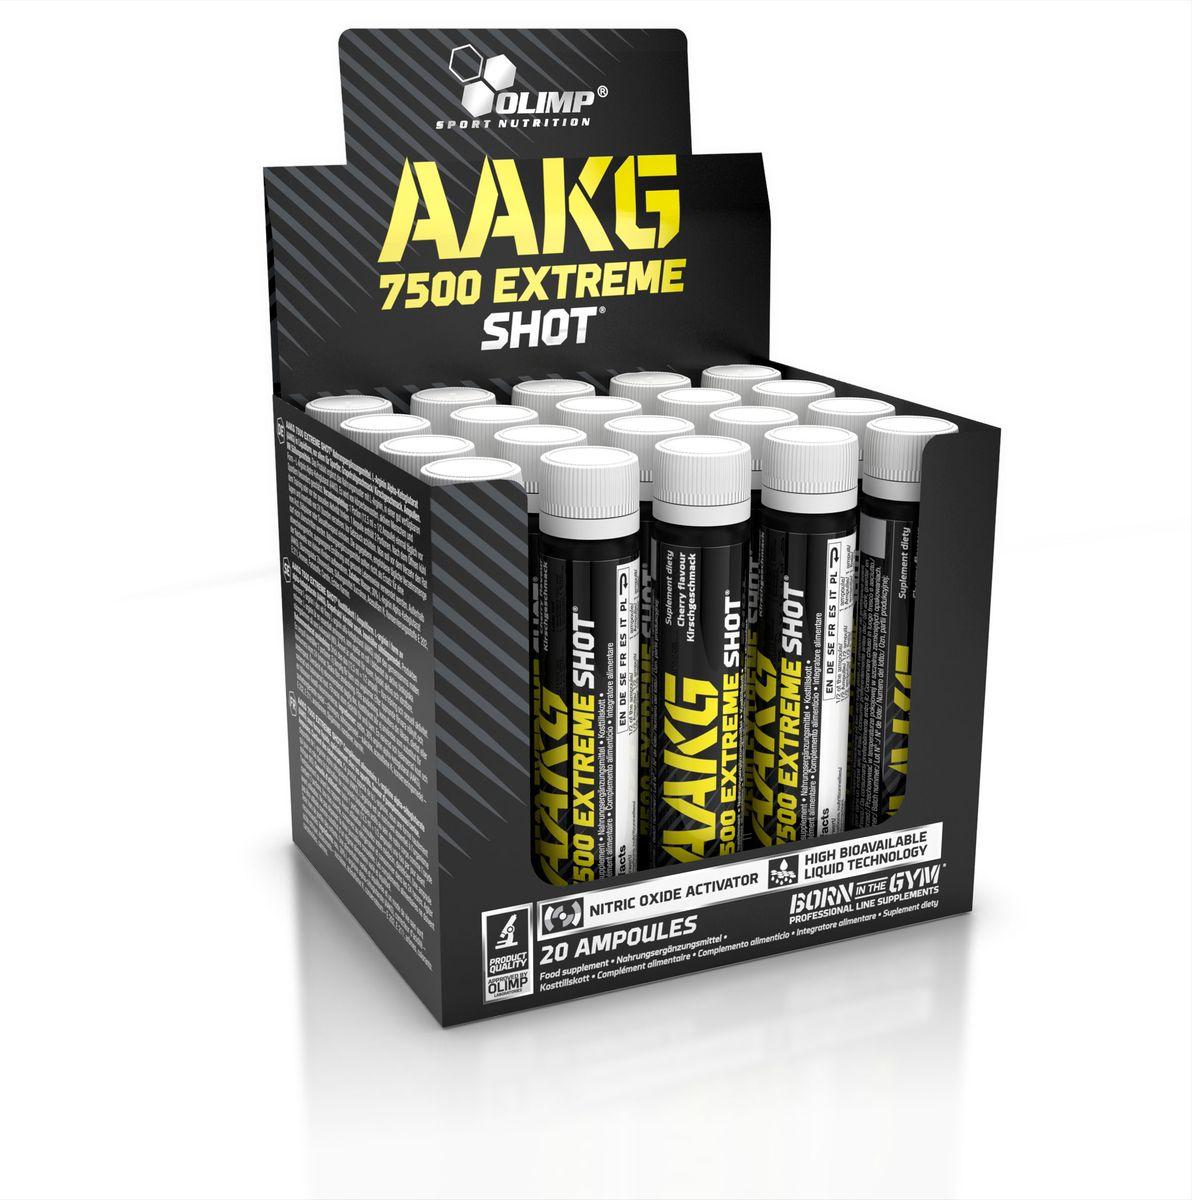 "Аргинин Olimp Sport Nutrition ""AAKG 7500 Extreme Shot"", вишня, 20 х 25 мл"